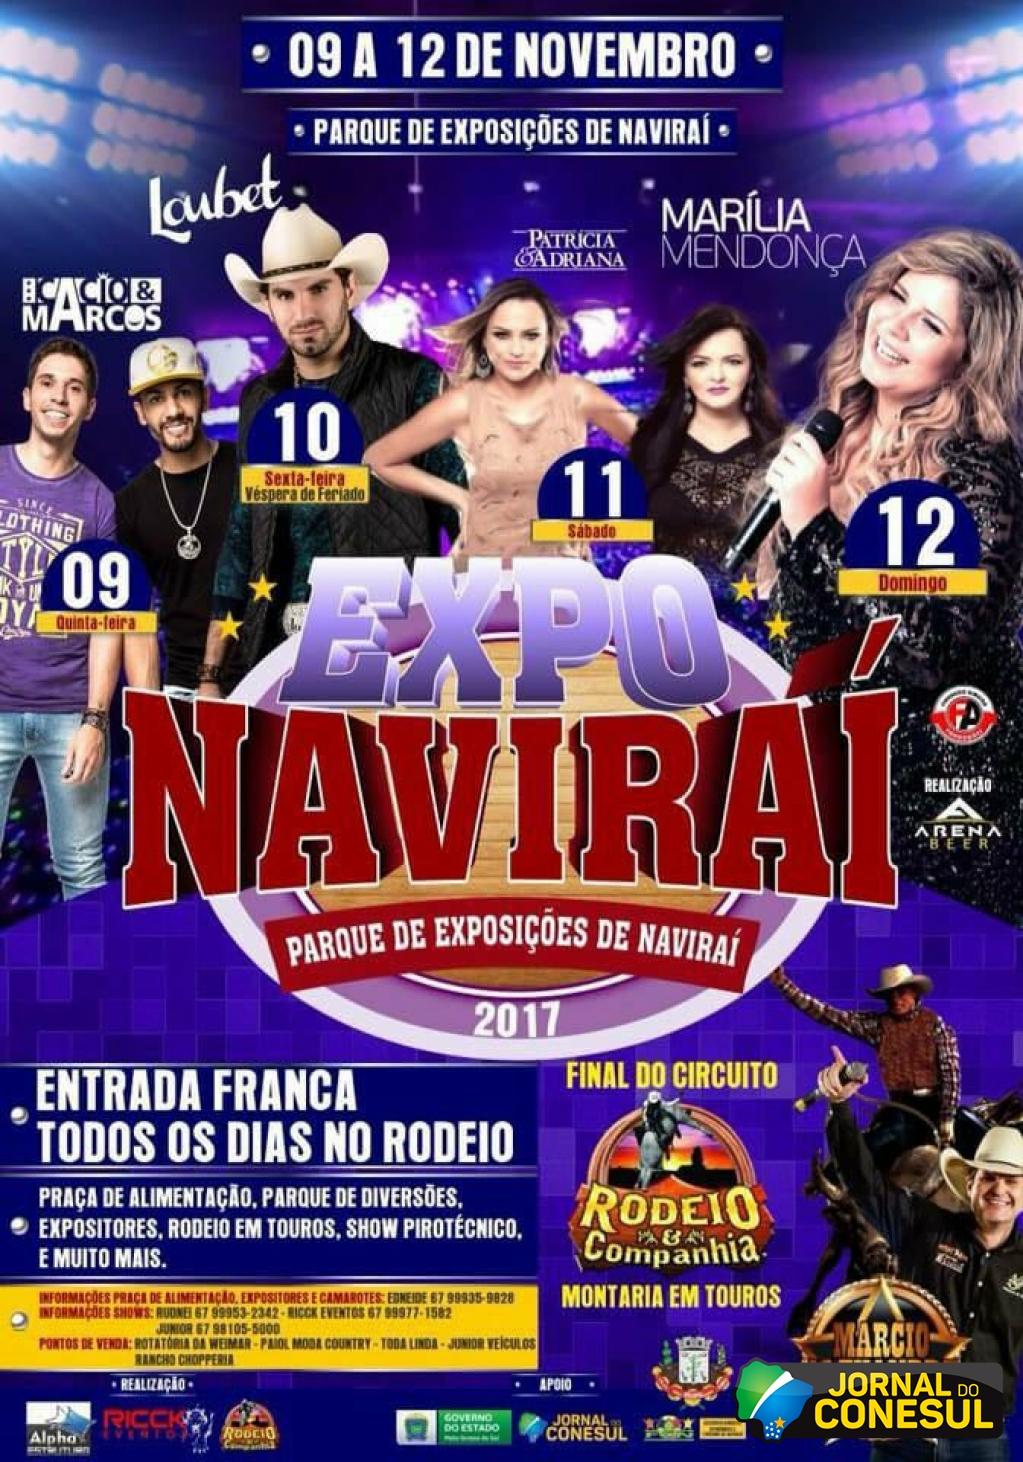 Circuito Rodeio 2018 : Jornal do conesul expo naviraí com entrada franca no rodeio